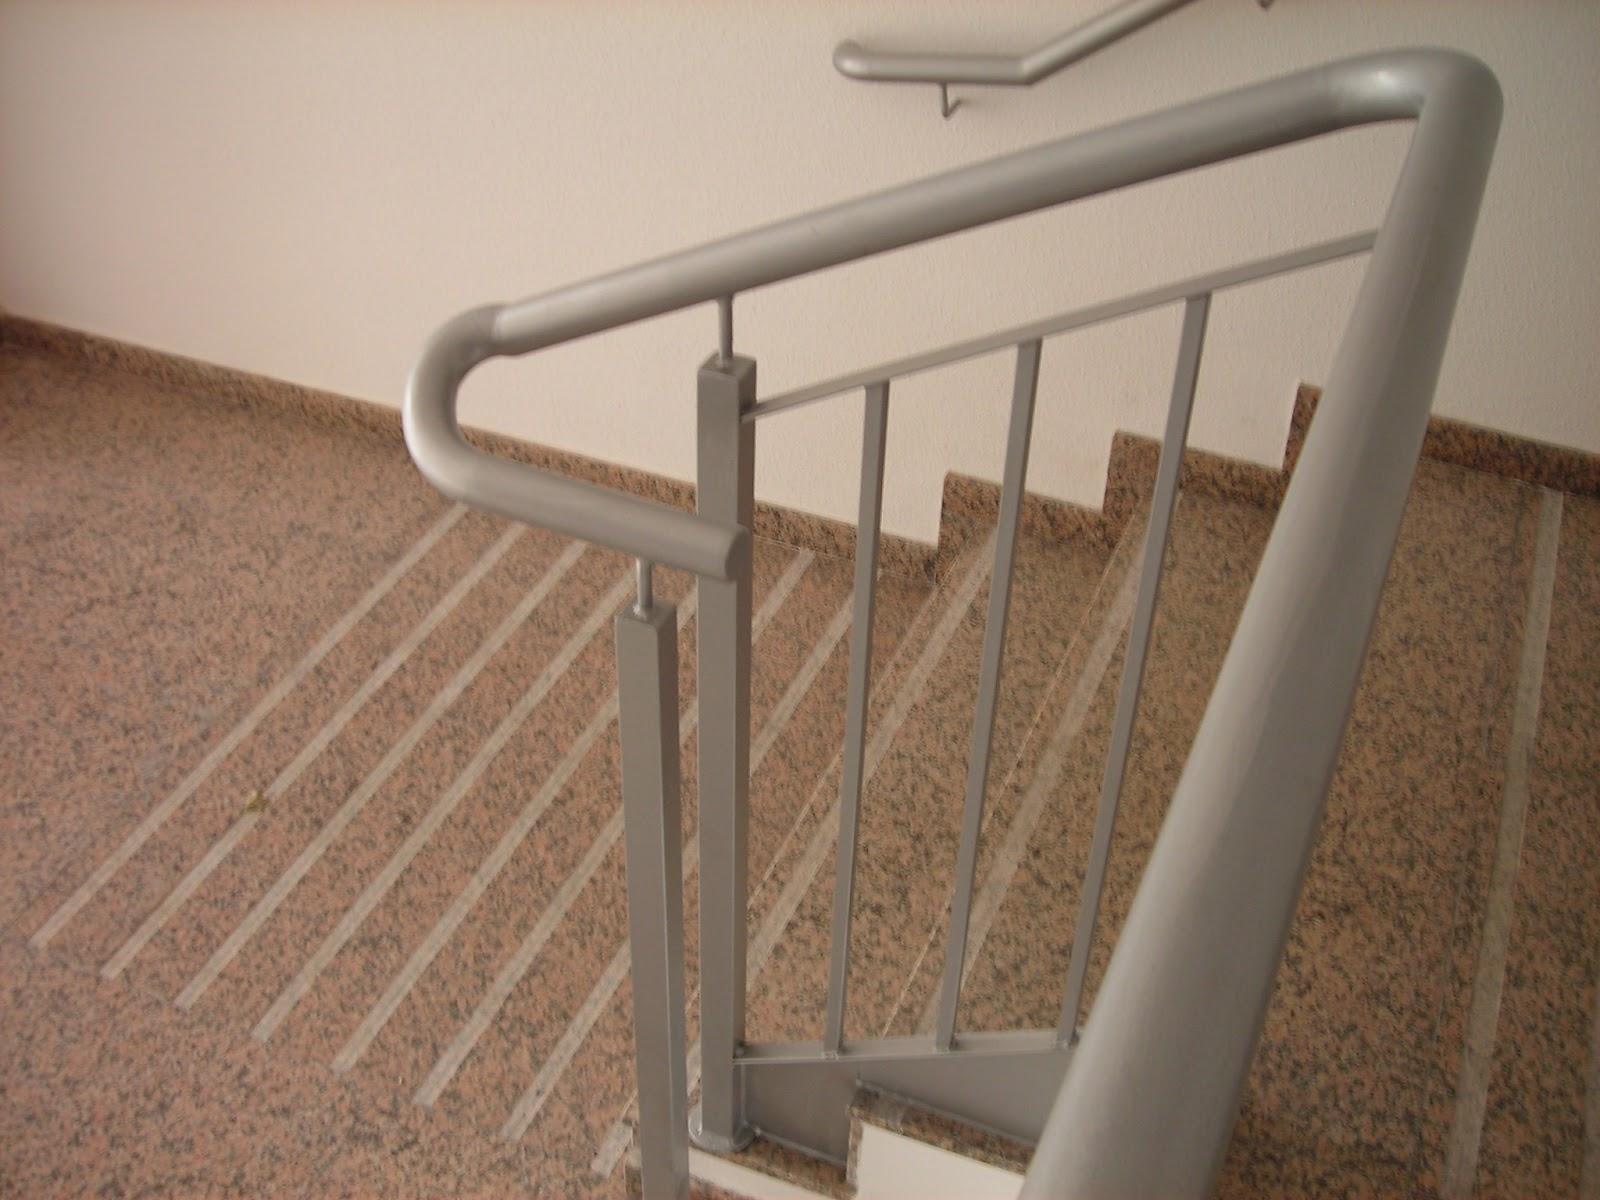 Barandillas interiores barandas en vidrio para escaleras - Barandillas de forja para escaleras de interior ...